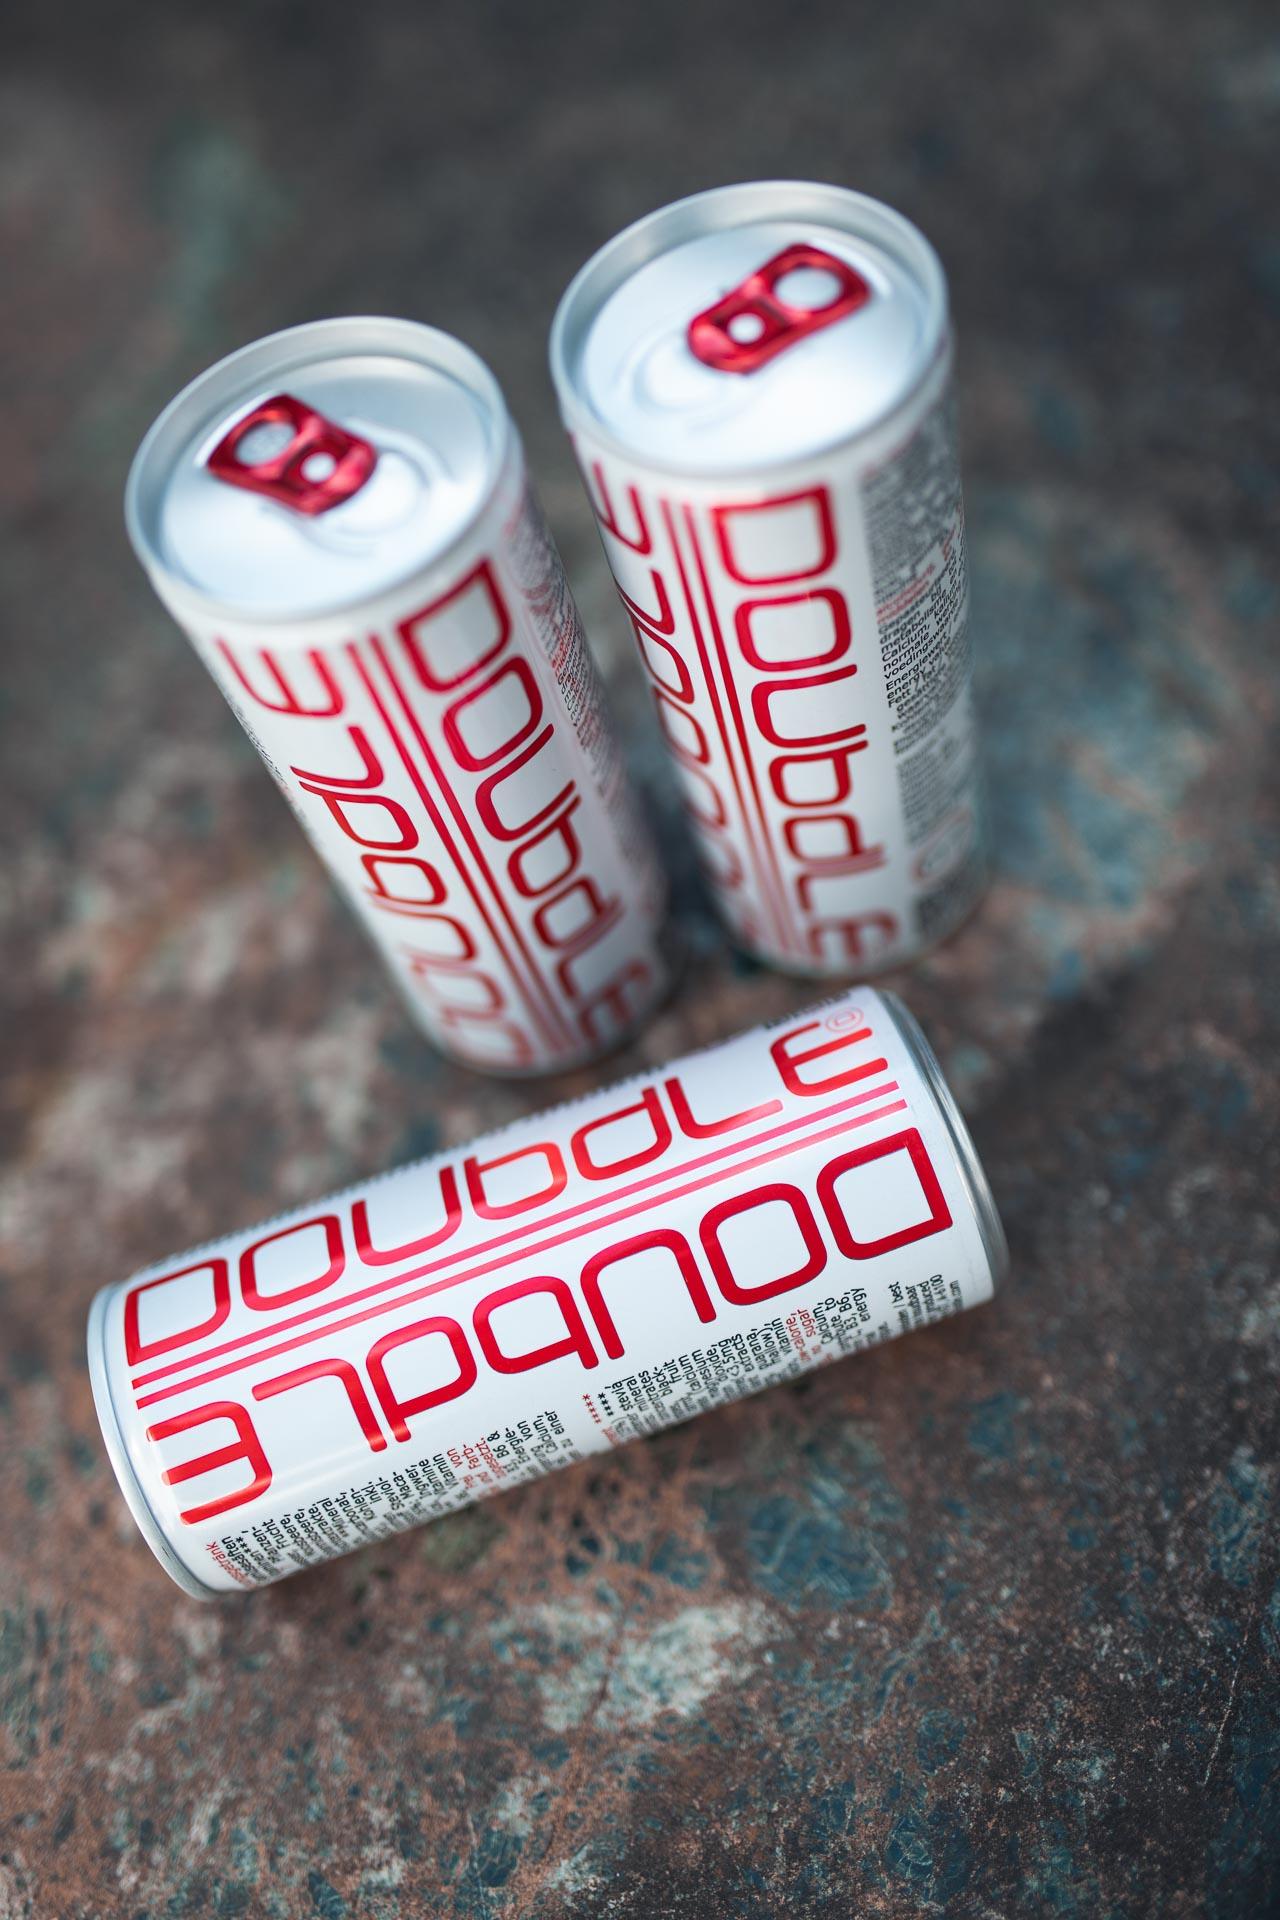 gesunde alternative Energy Drink, Erfrischungsgetränk